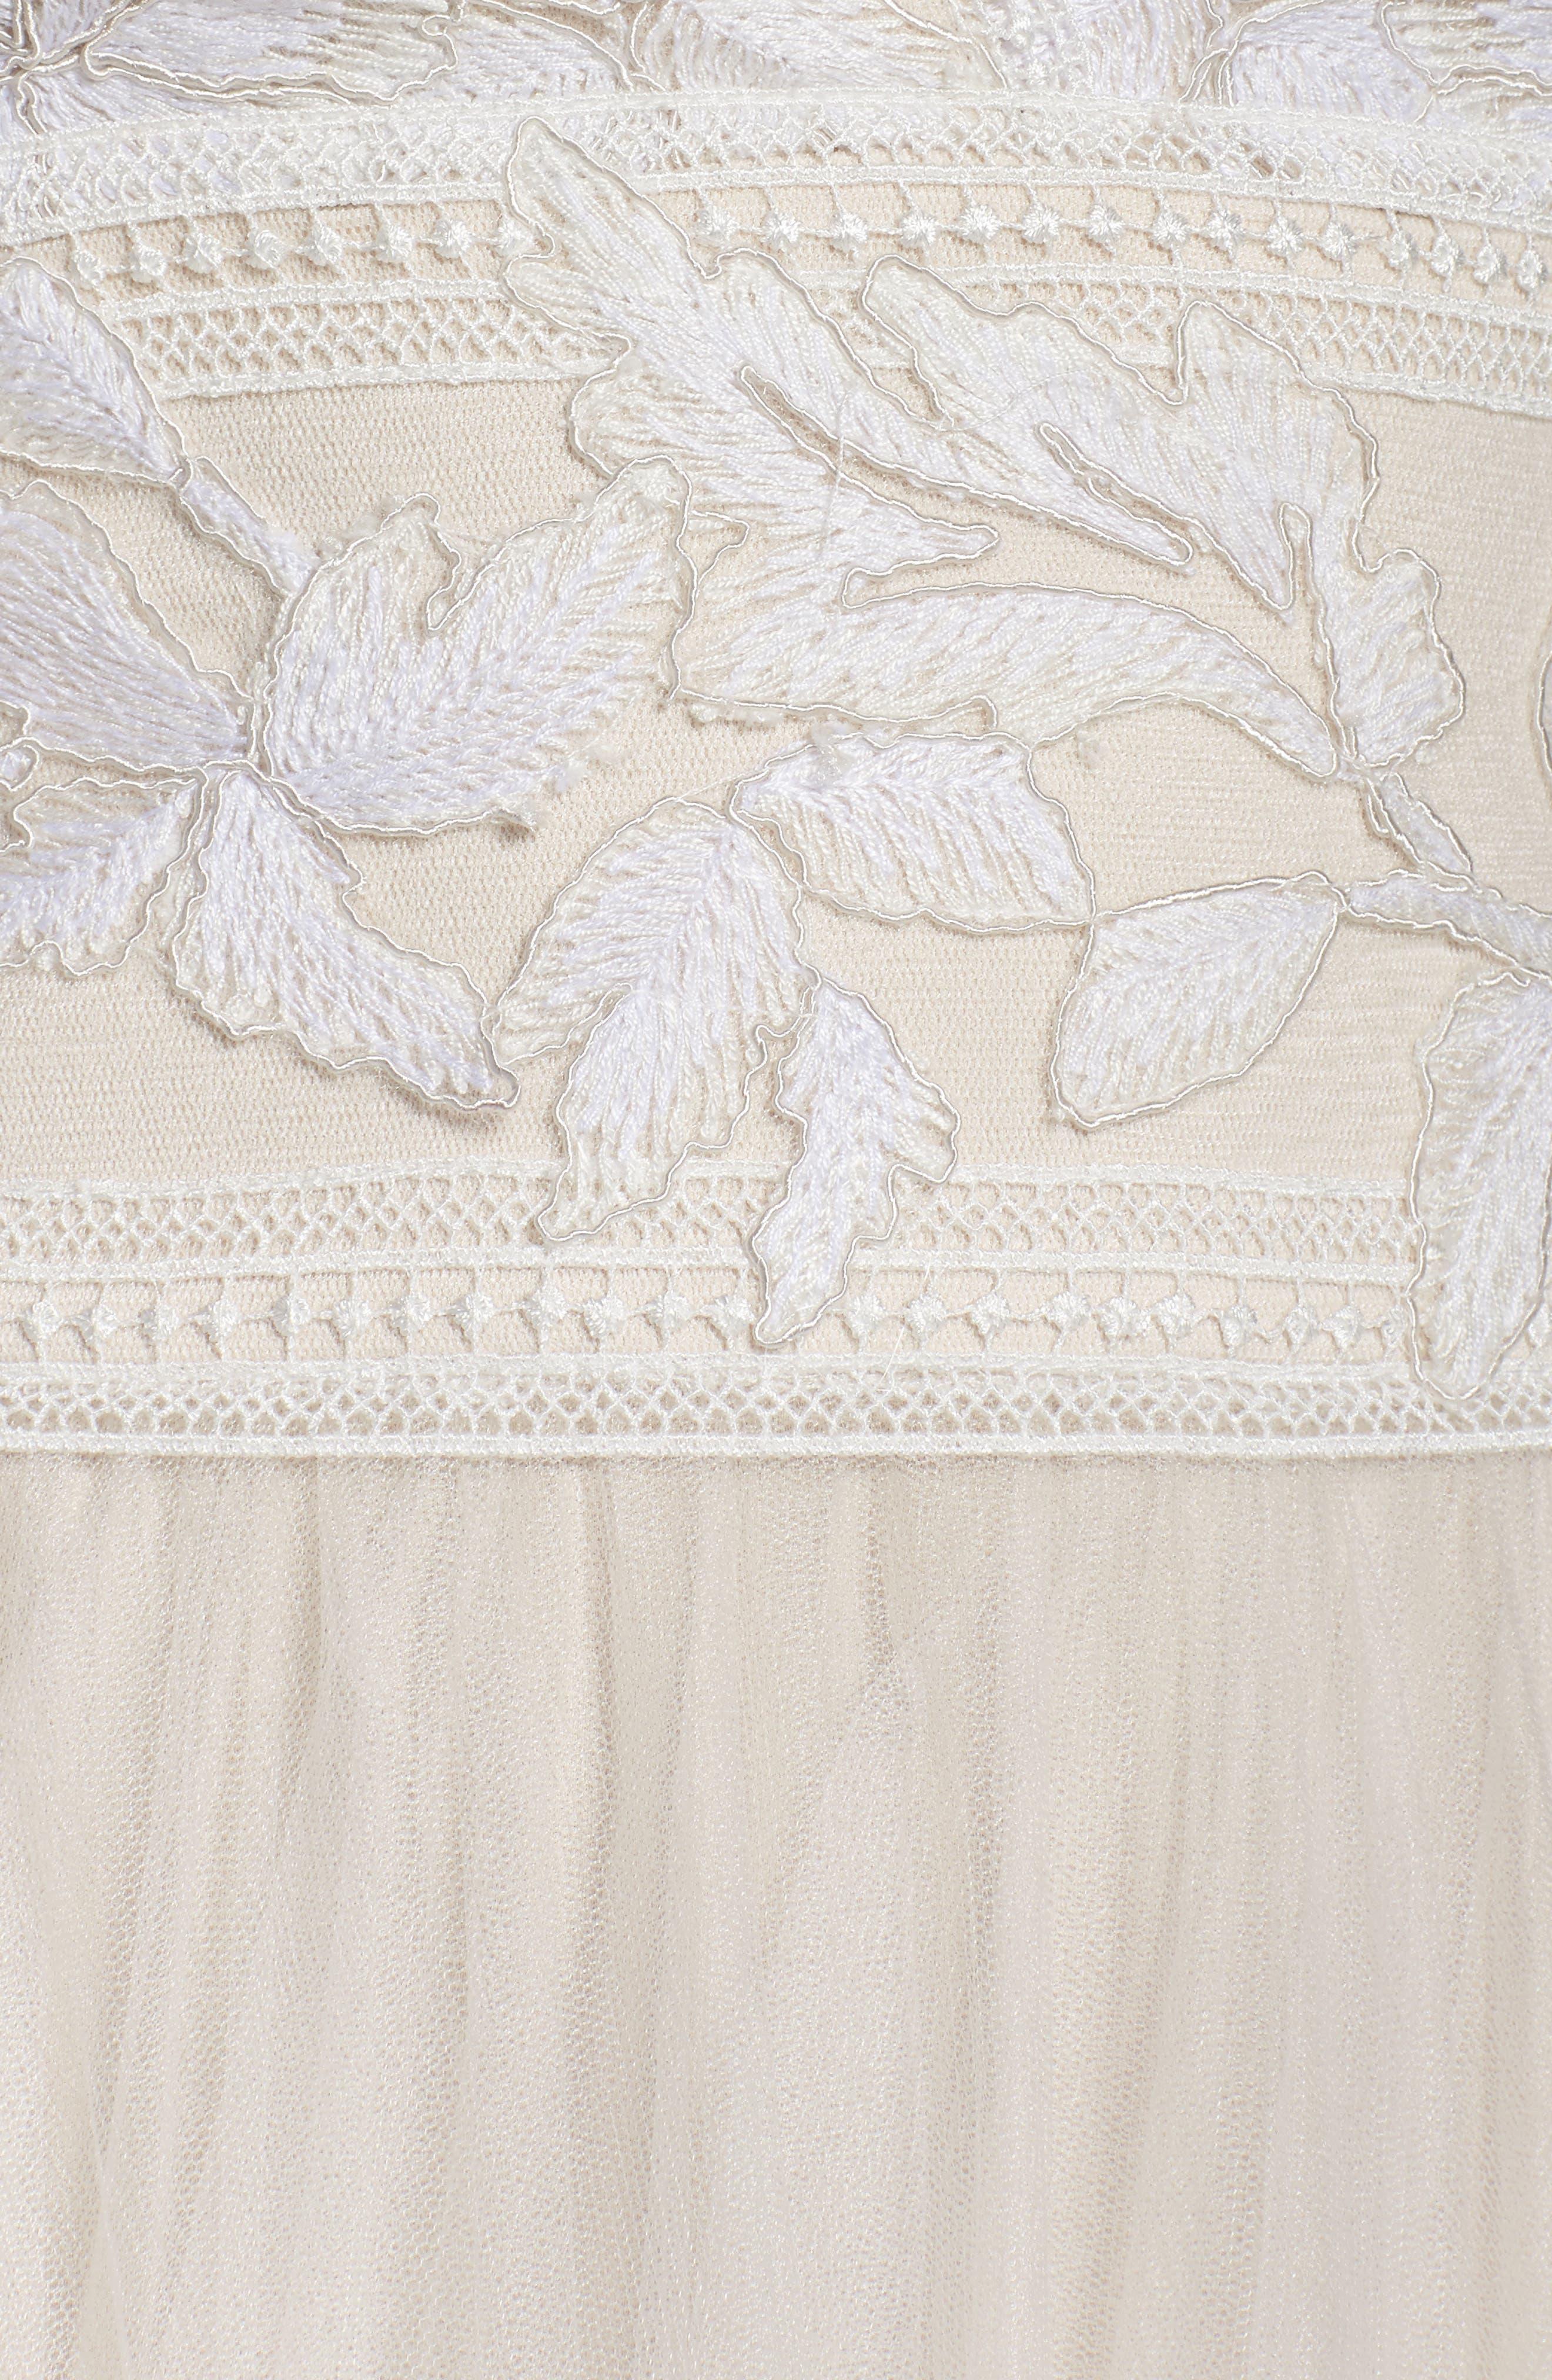 Tulle Lace A-Line Gown,                             Alternate thumbnail 5, color,                             Ivory/ Petal